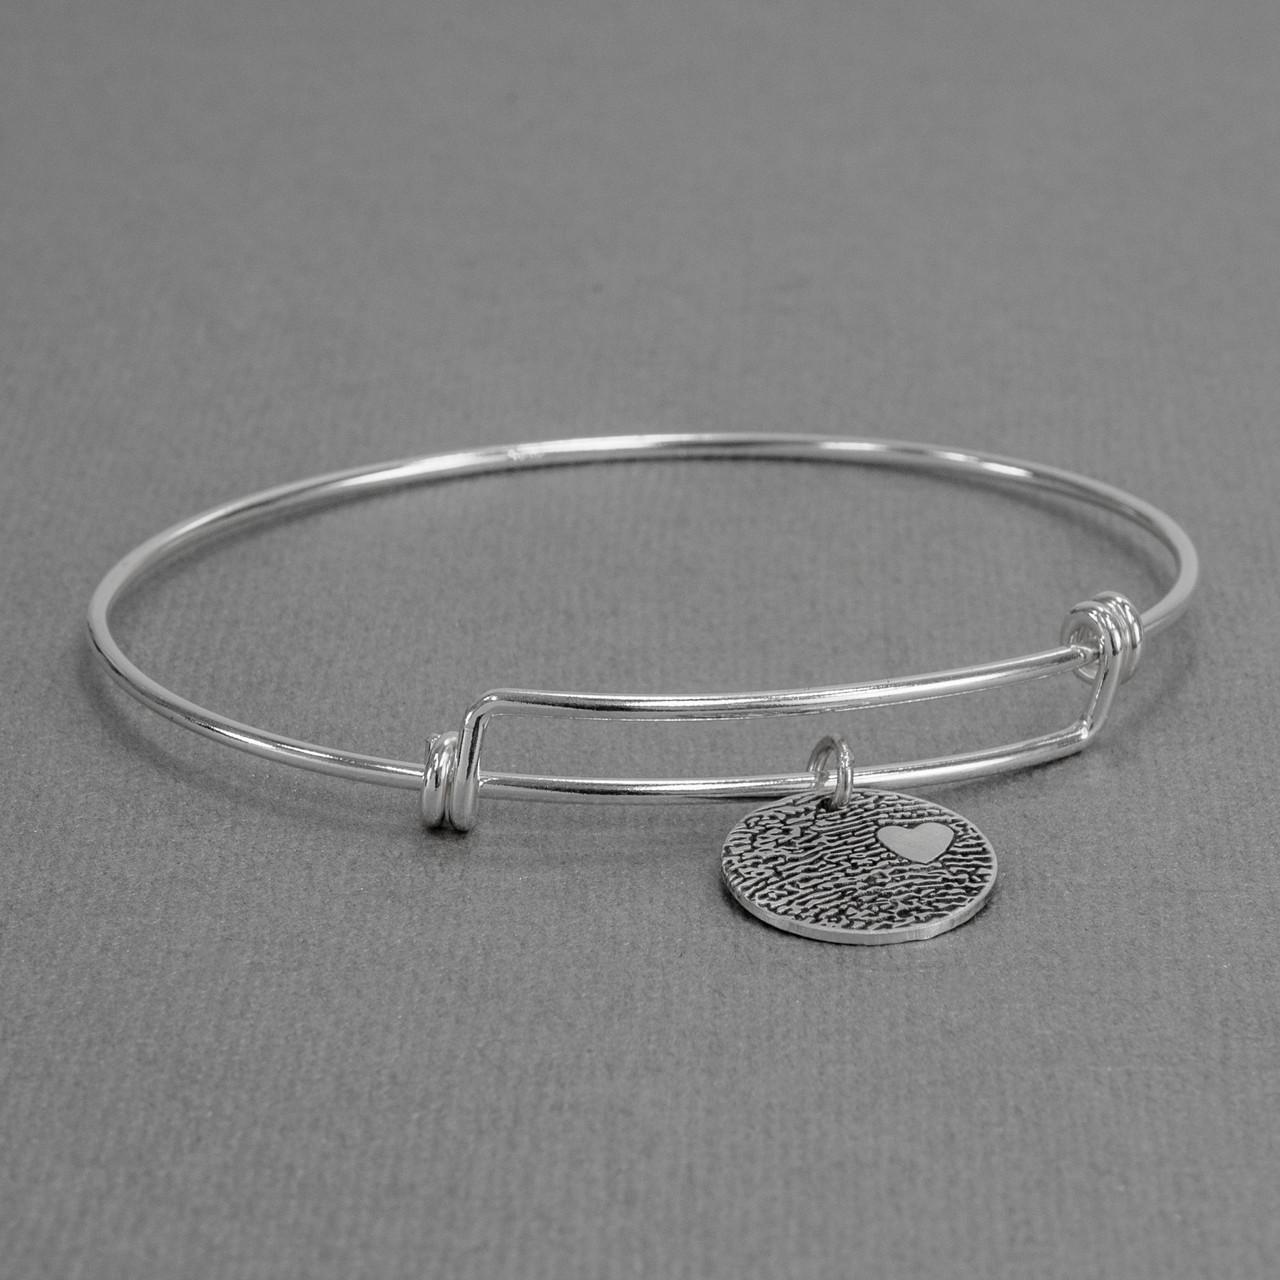 Expandable sterling silver bracelet with custom fingerprint pendant